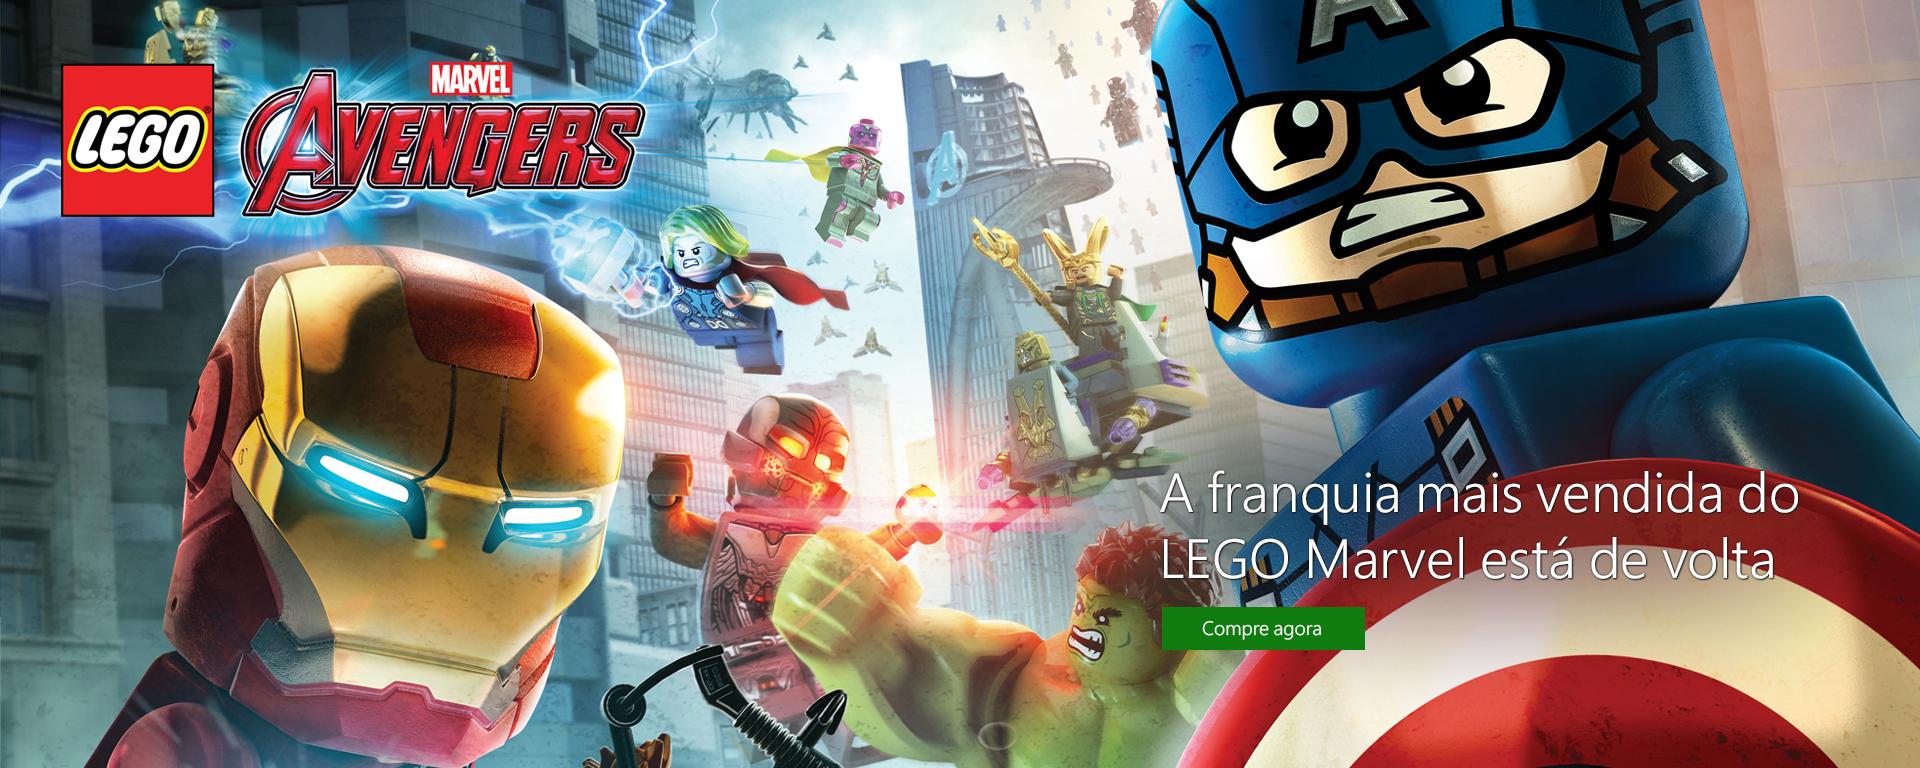 Lego Avnegers